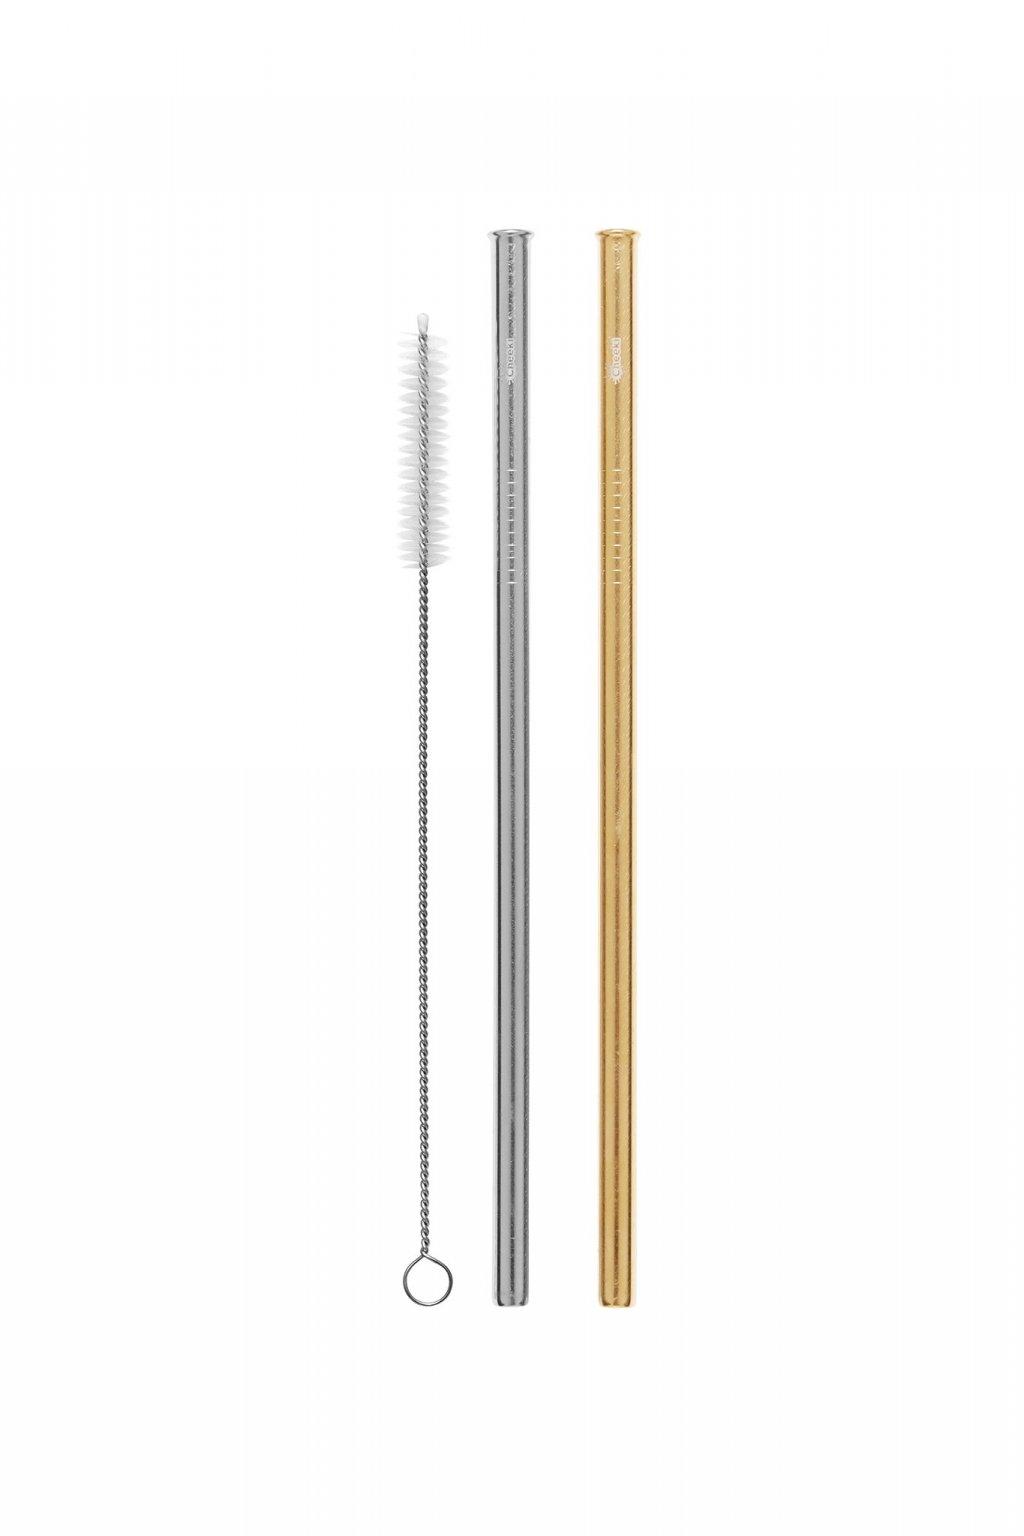 Straws 2pc Straight SilverGold